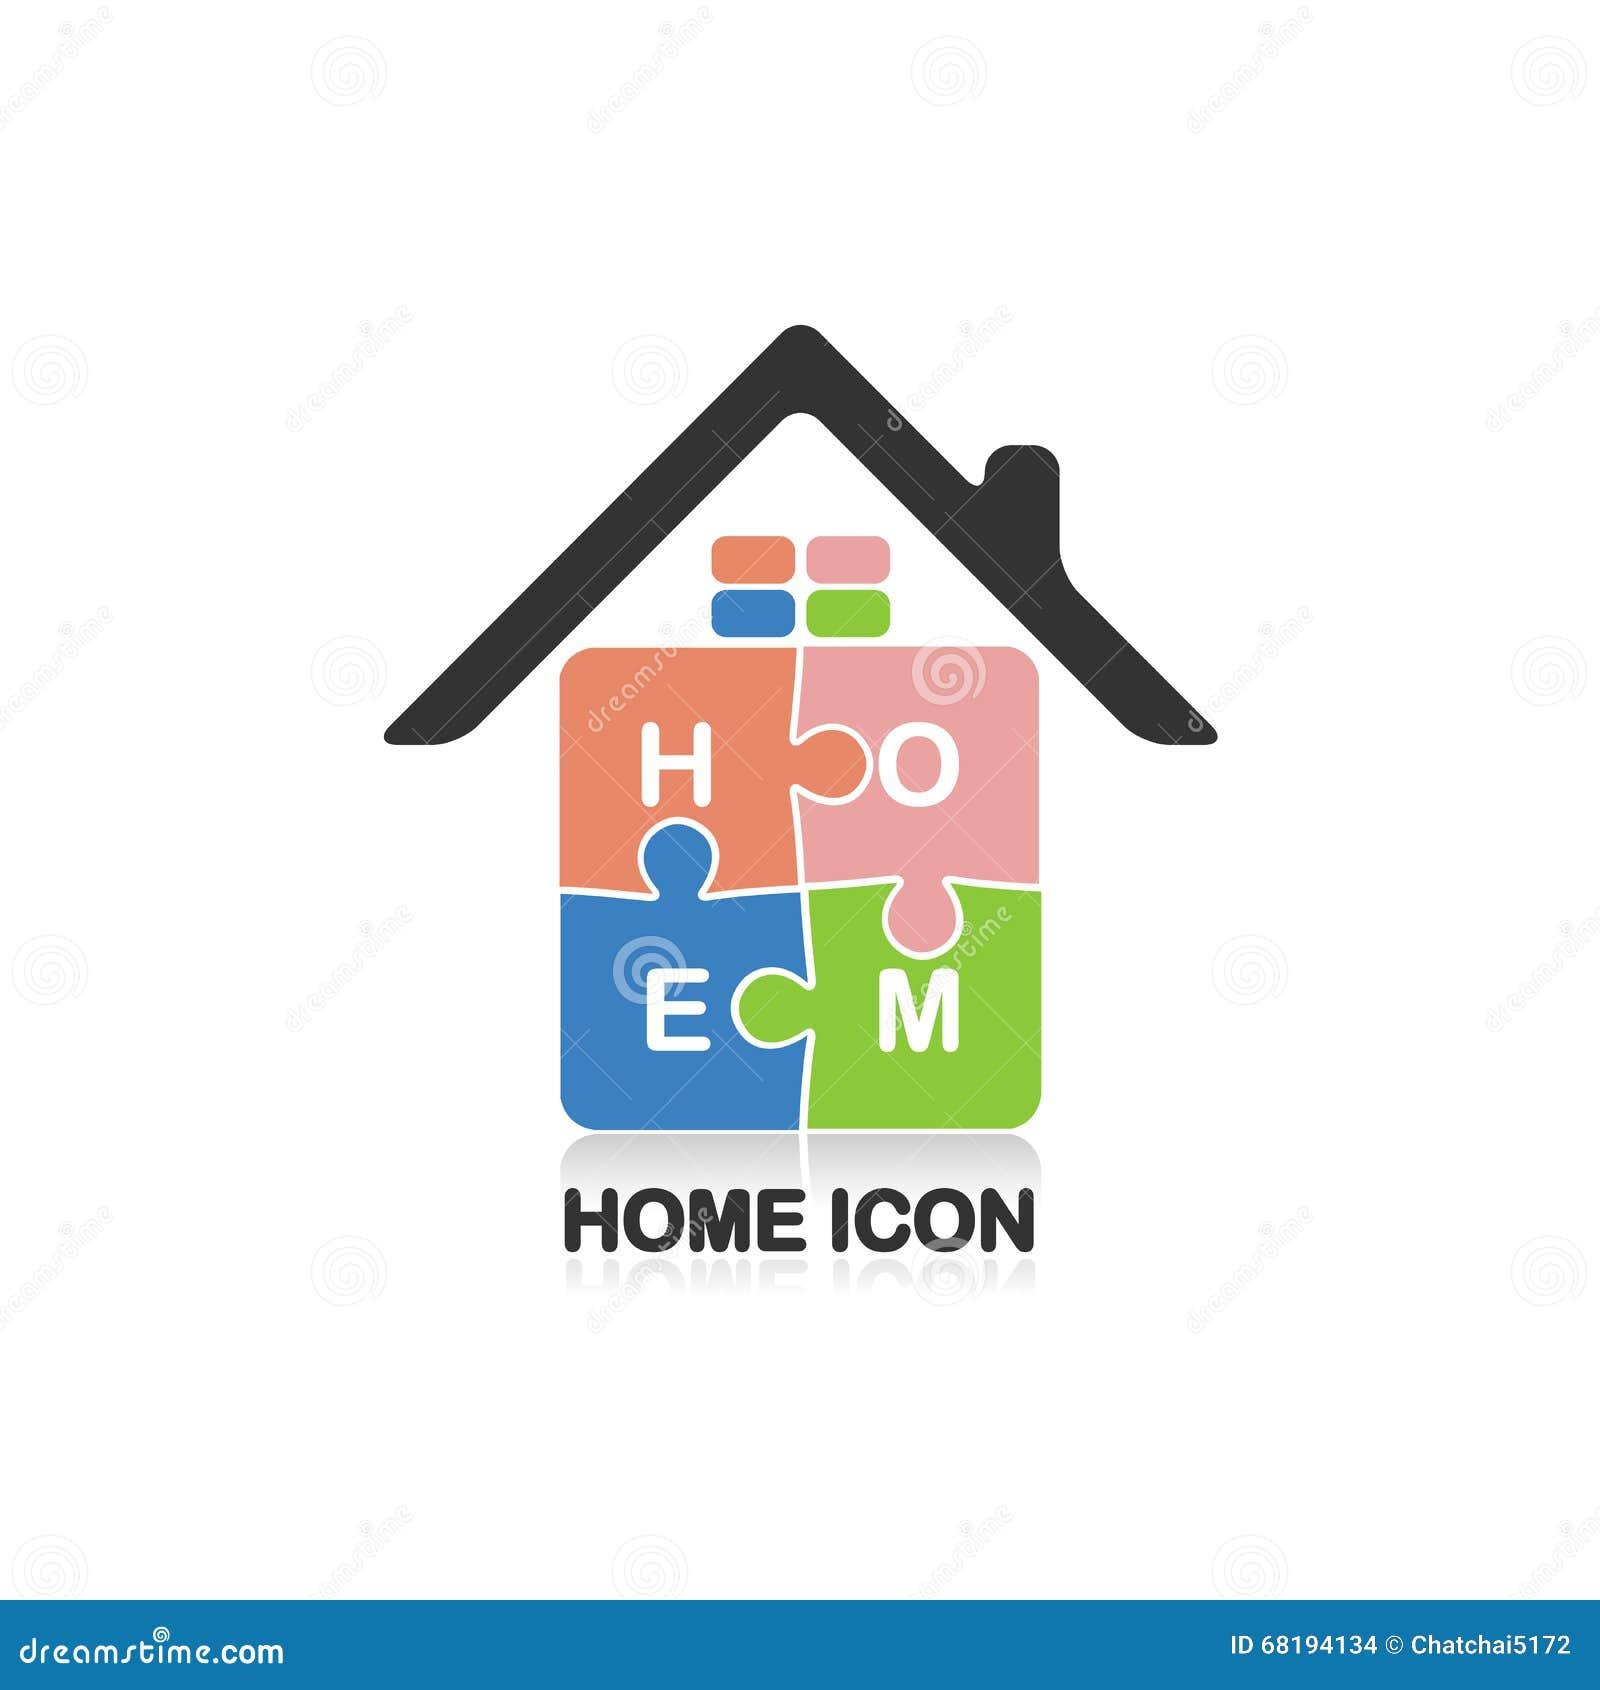 Real Estate Logocreative House Logoabstract Buildings Sign